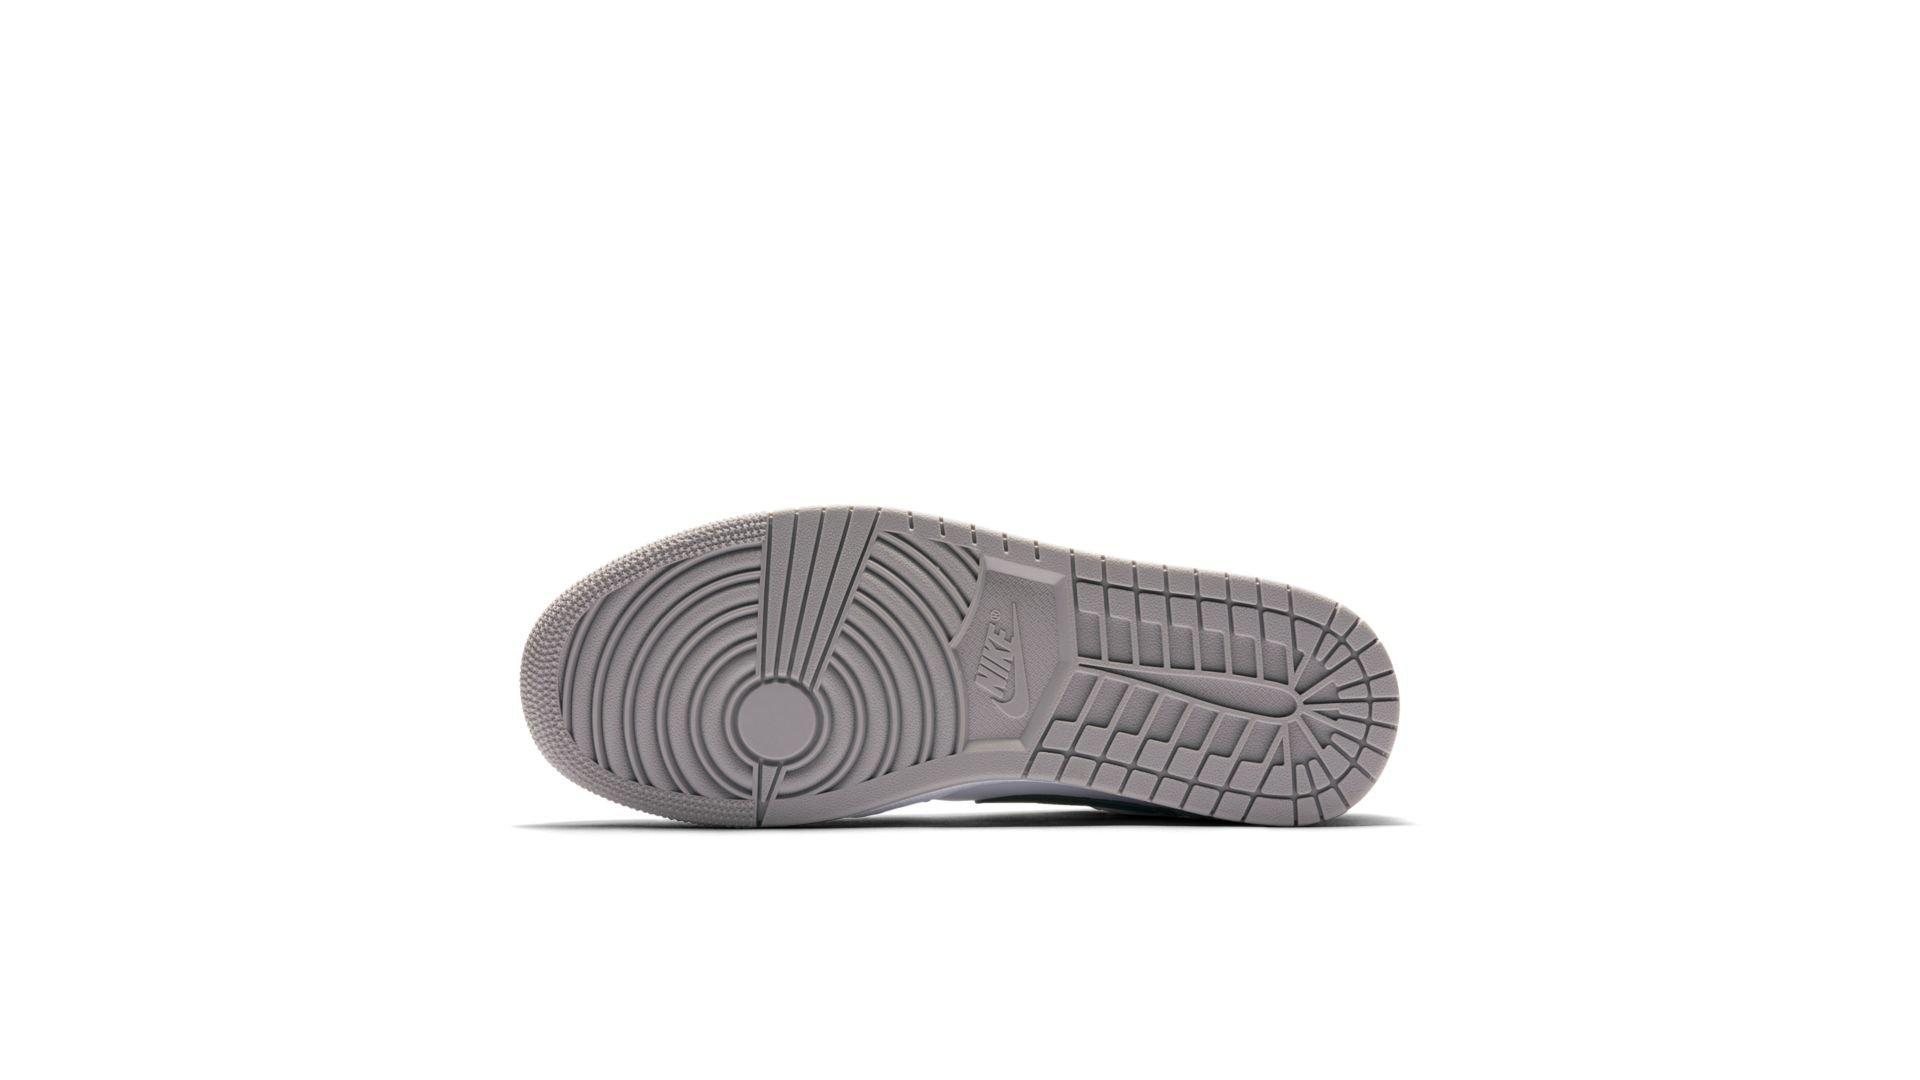 Jordan 1 Low Grey Toe (553558-110)